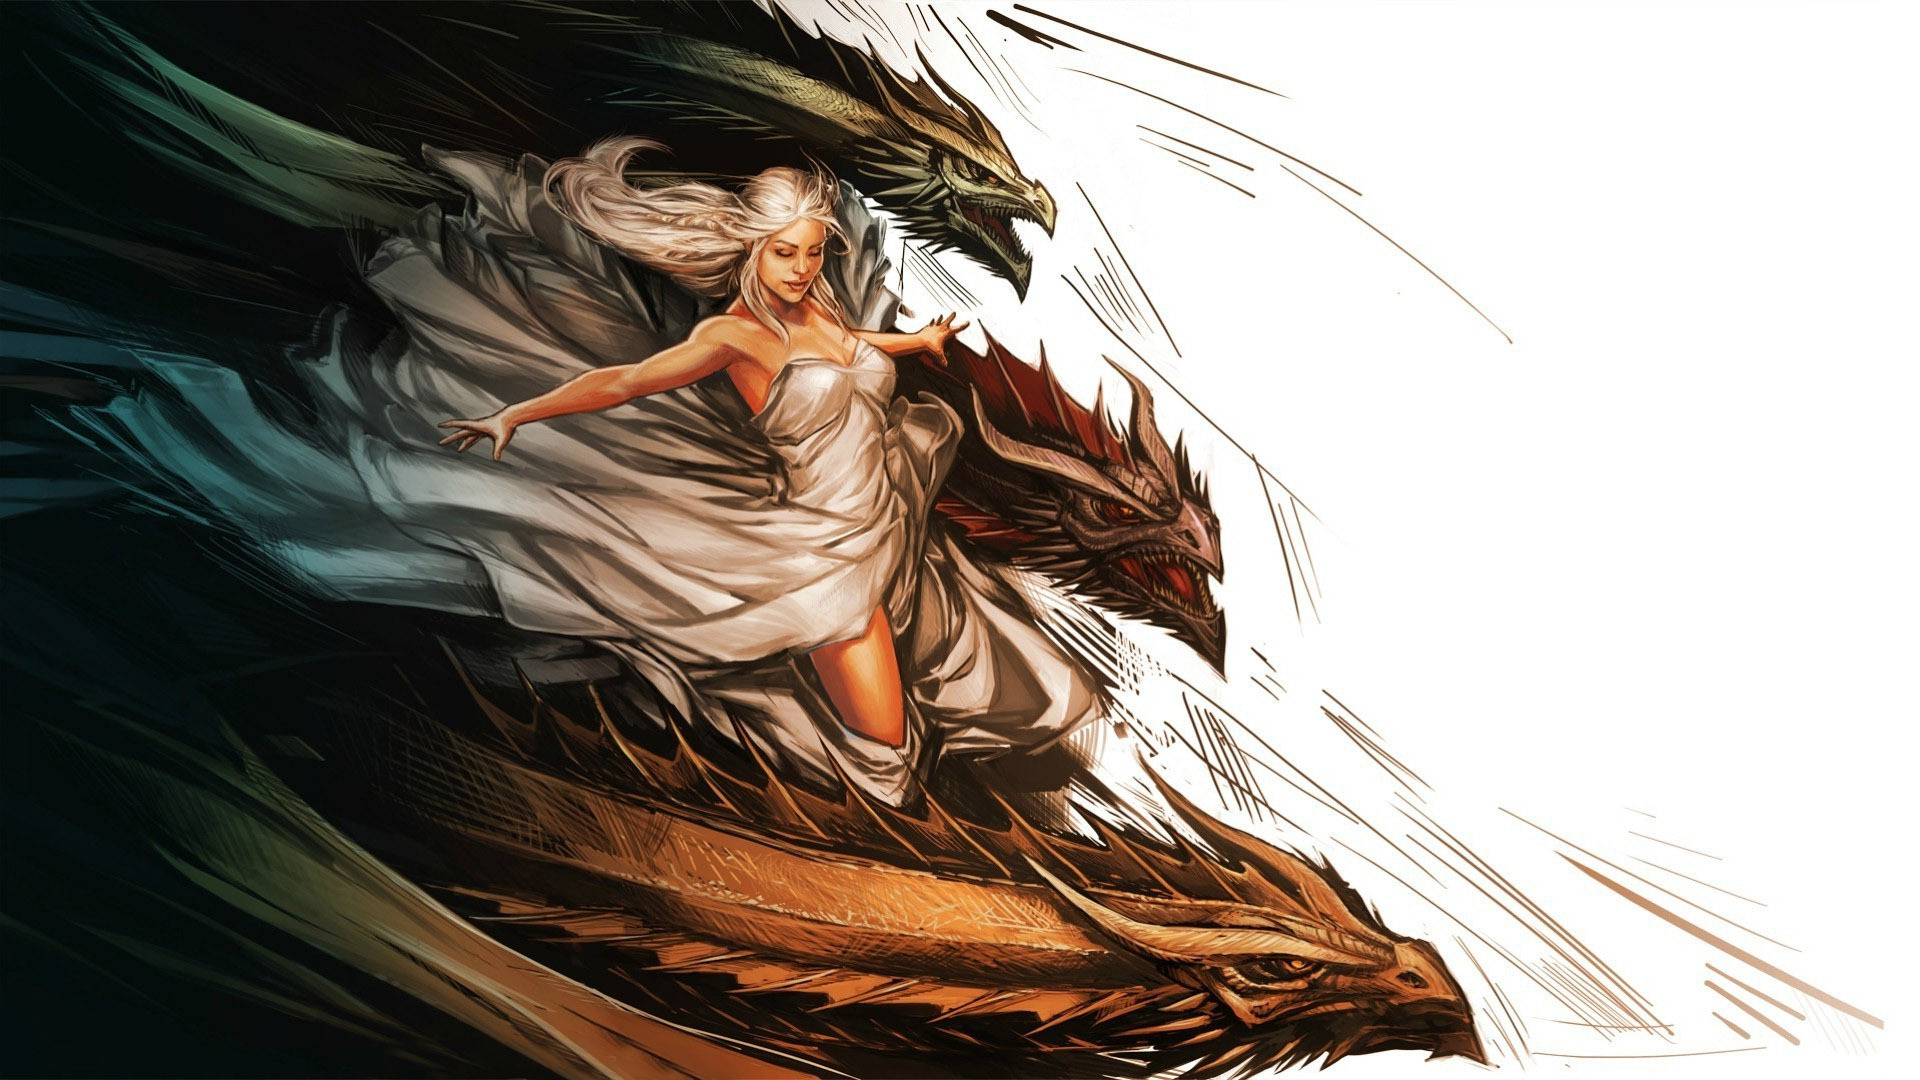 khaleesi wallpaper game - photo #18